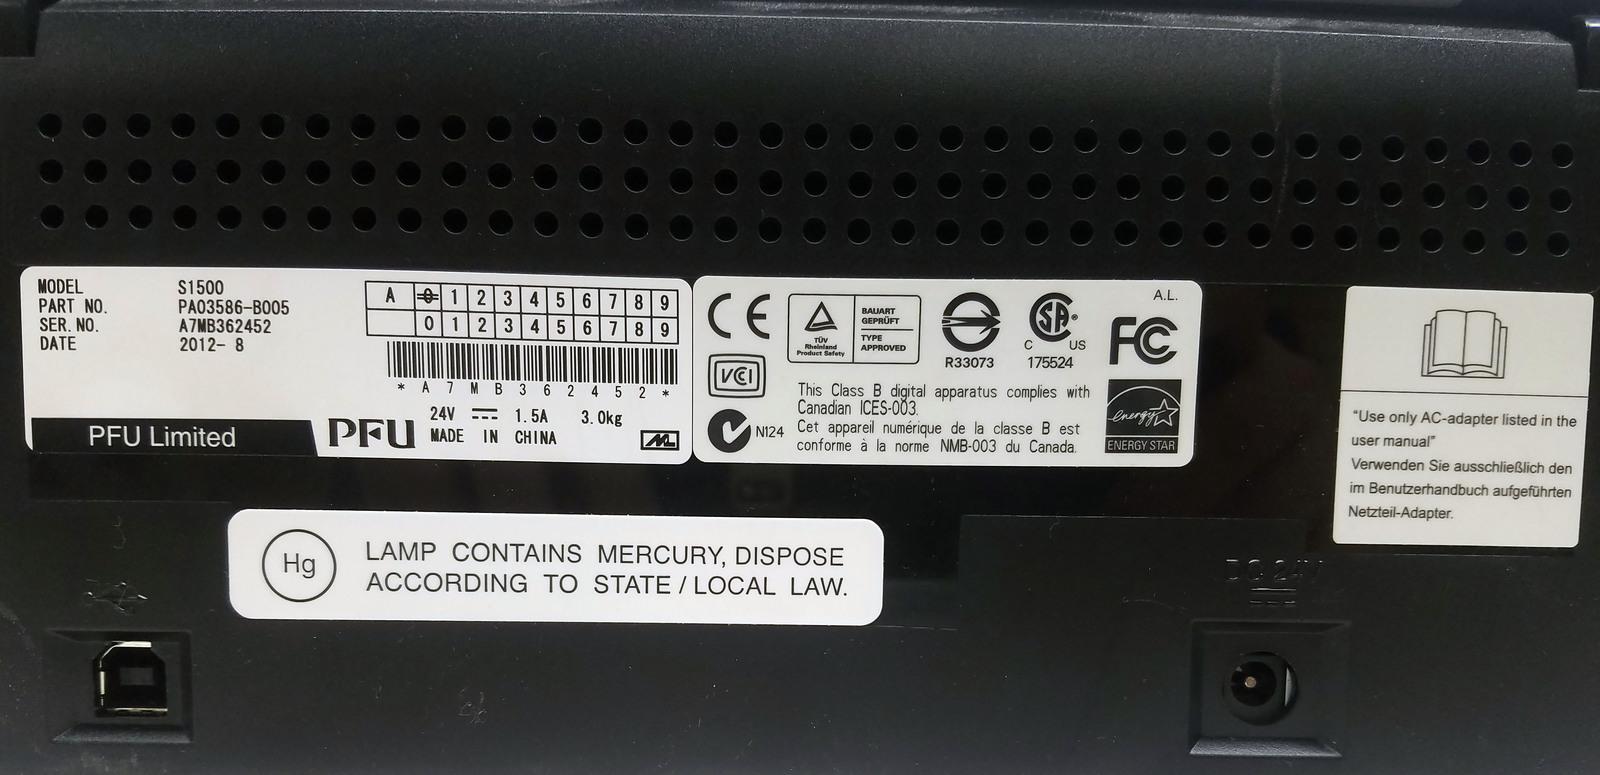 Fujitsu ScanSnap S1500 Scanner Bin:2